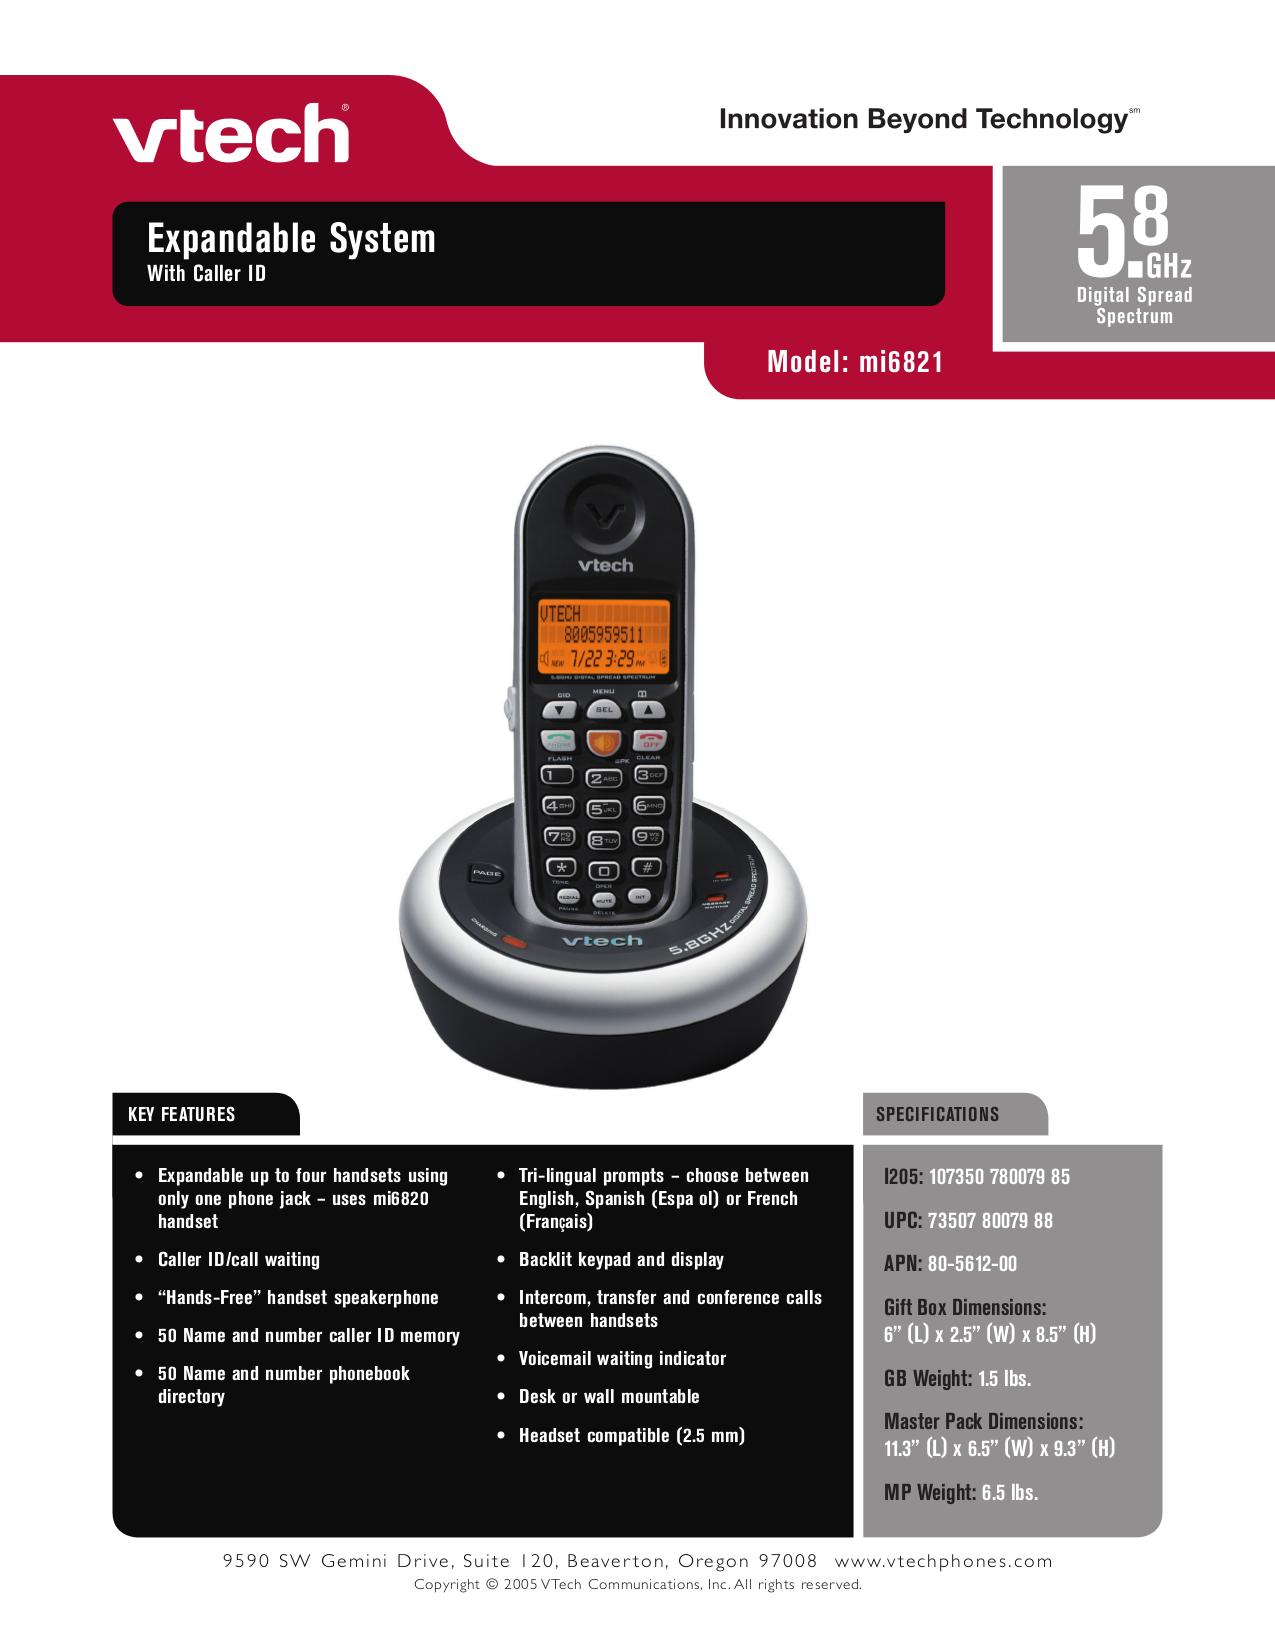 pdf for Vtech Telephone mi6821 manual